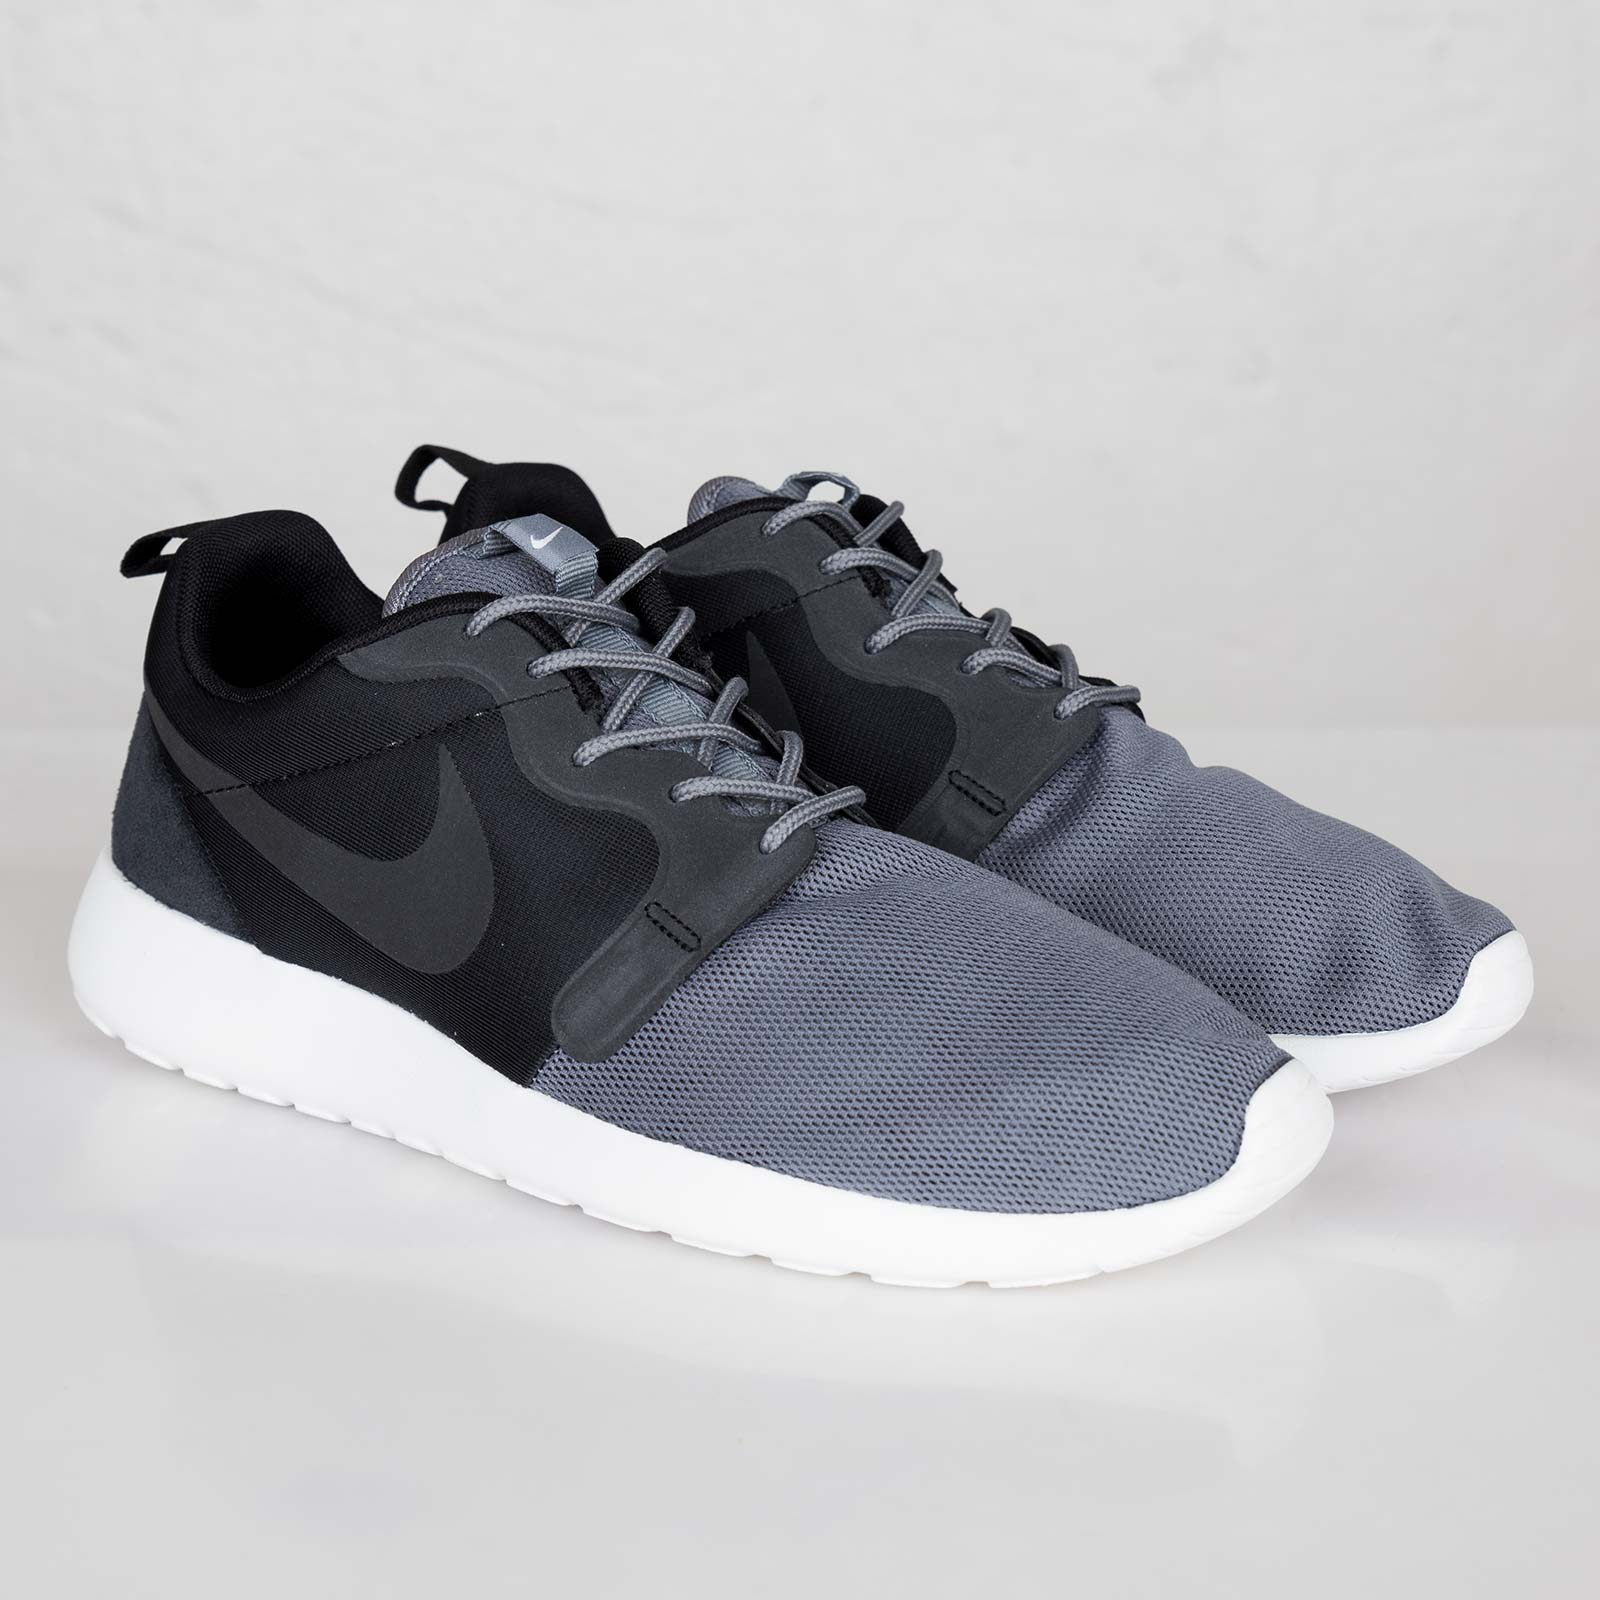 Nike Rosherun Hyperfuse QS Black & Cool Grey